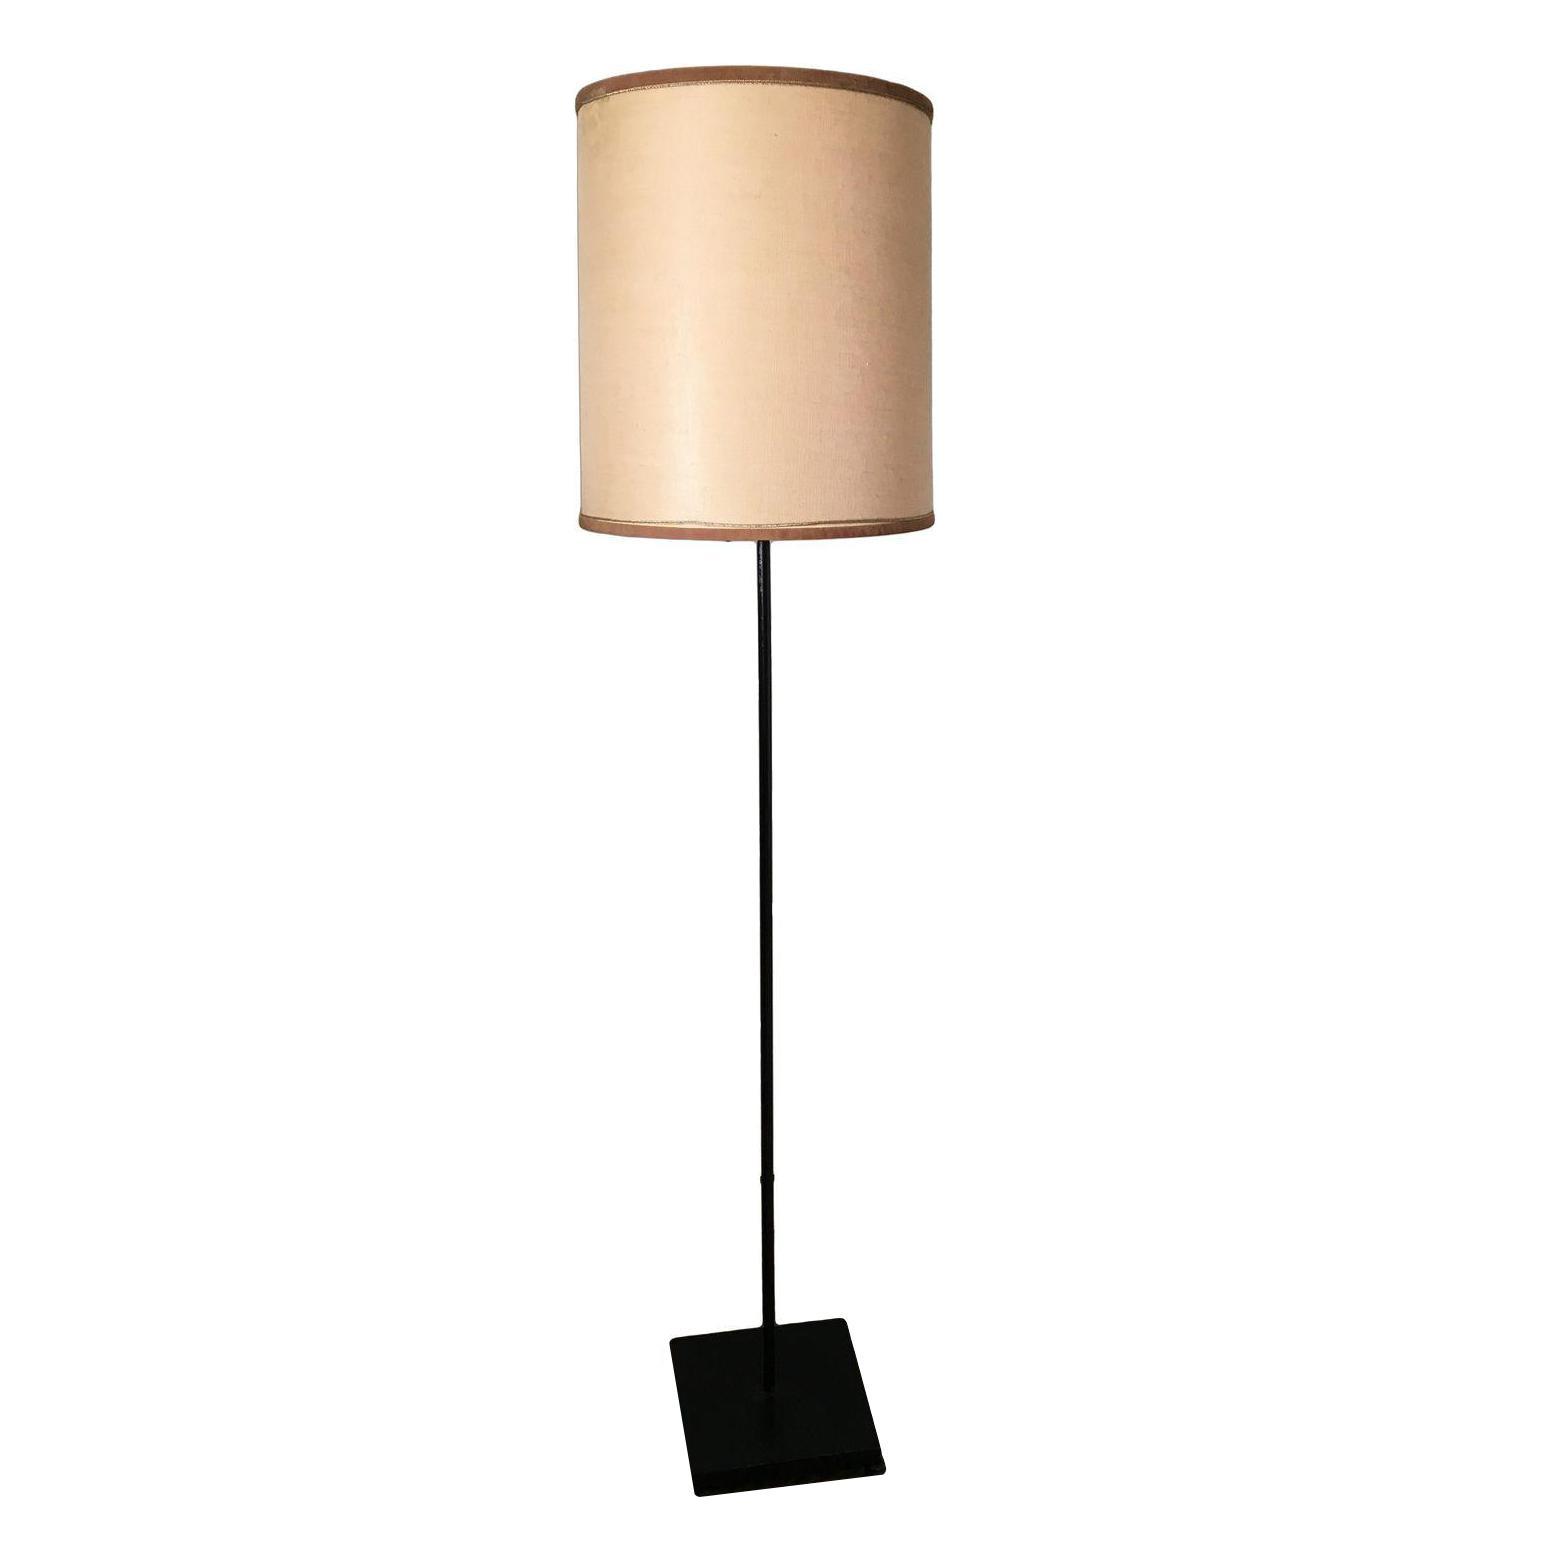 image of herco art midcentury modern floor lamp